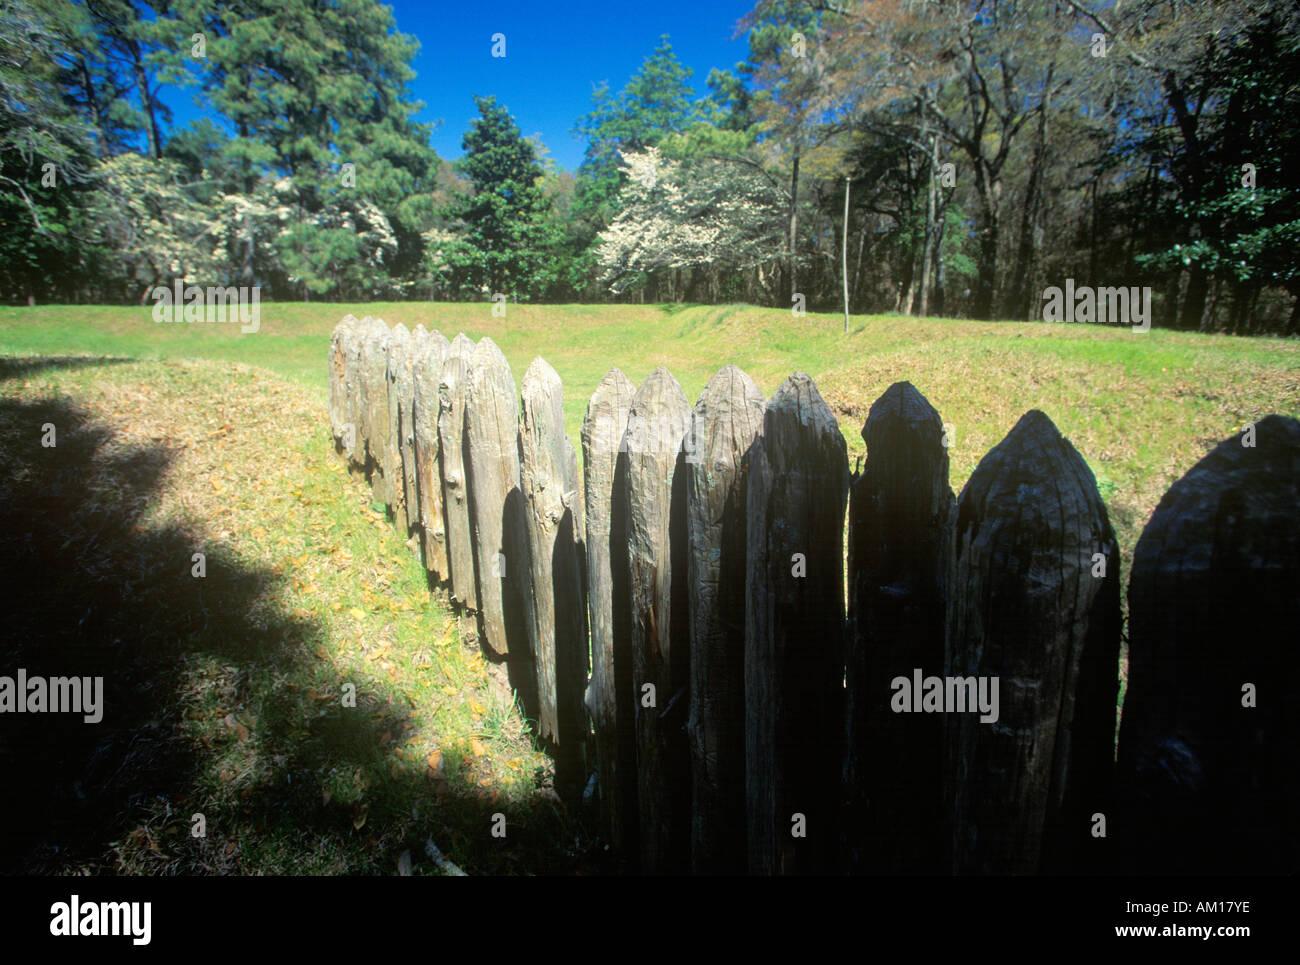 Gravestone commemorating The Lost Colony at Roanoke NC - Stock Image